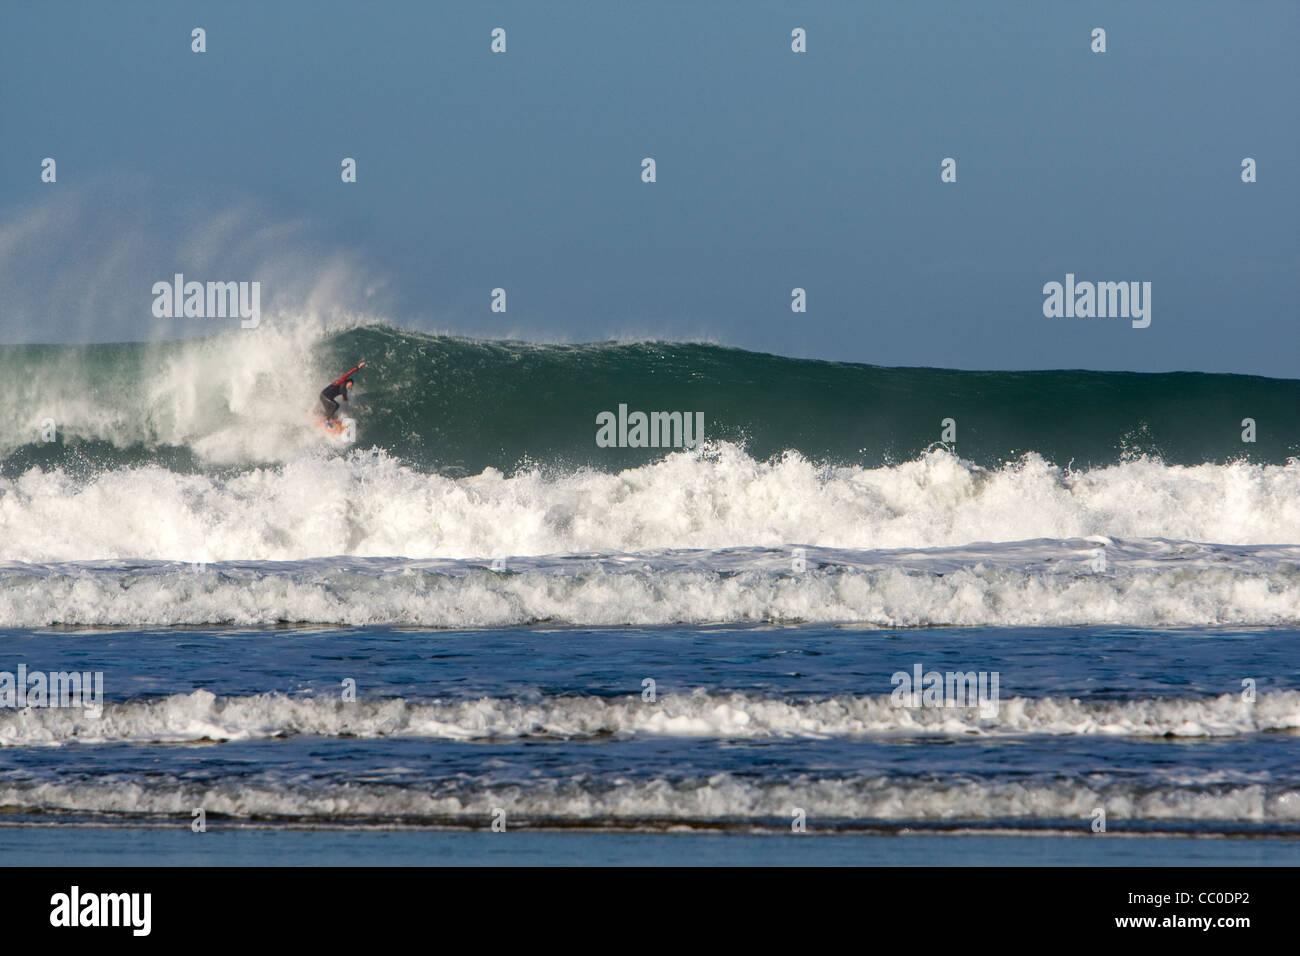 A surfer on a big wave at Porthtowan beach, Cornwall. - Stock Image